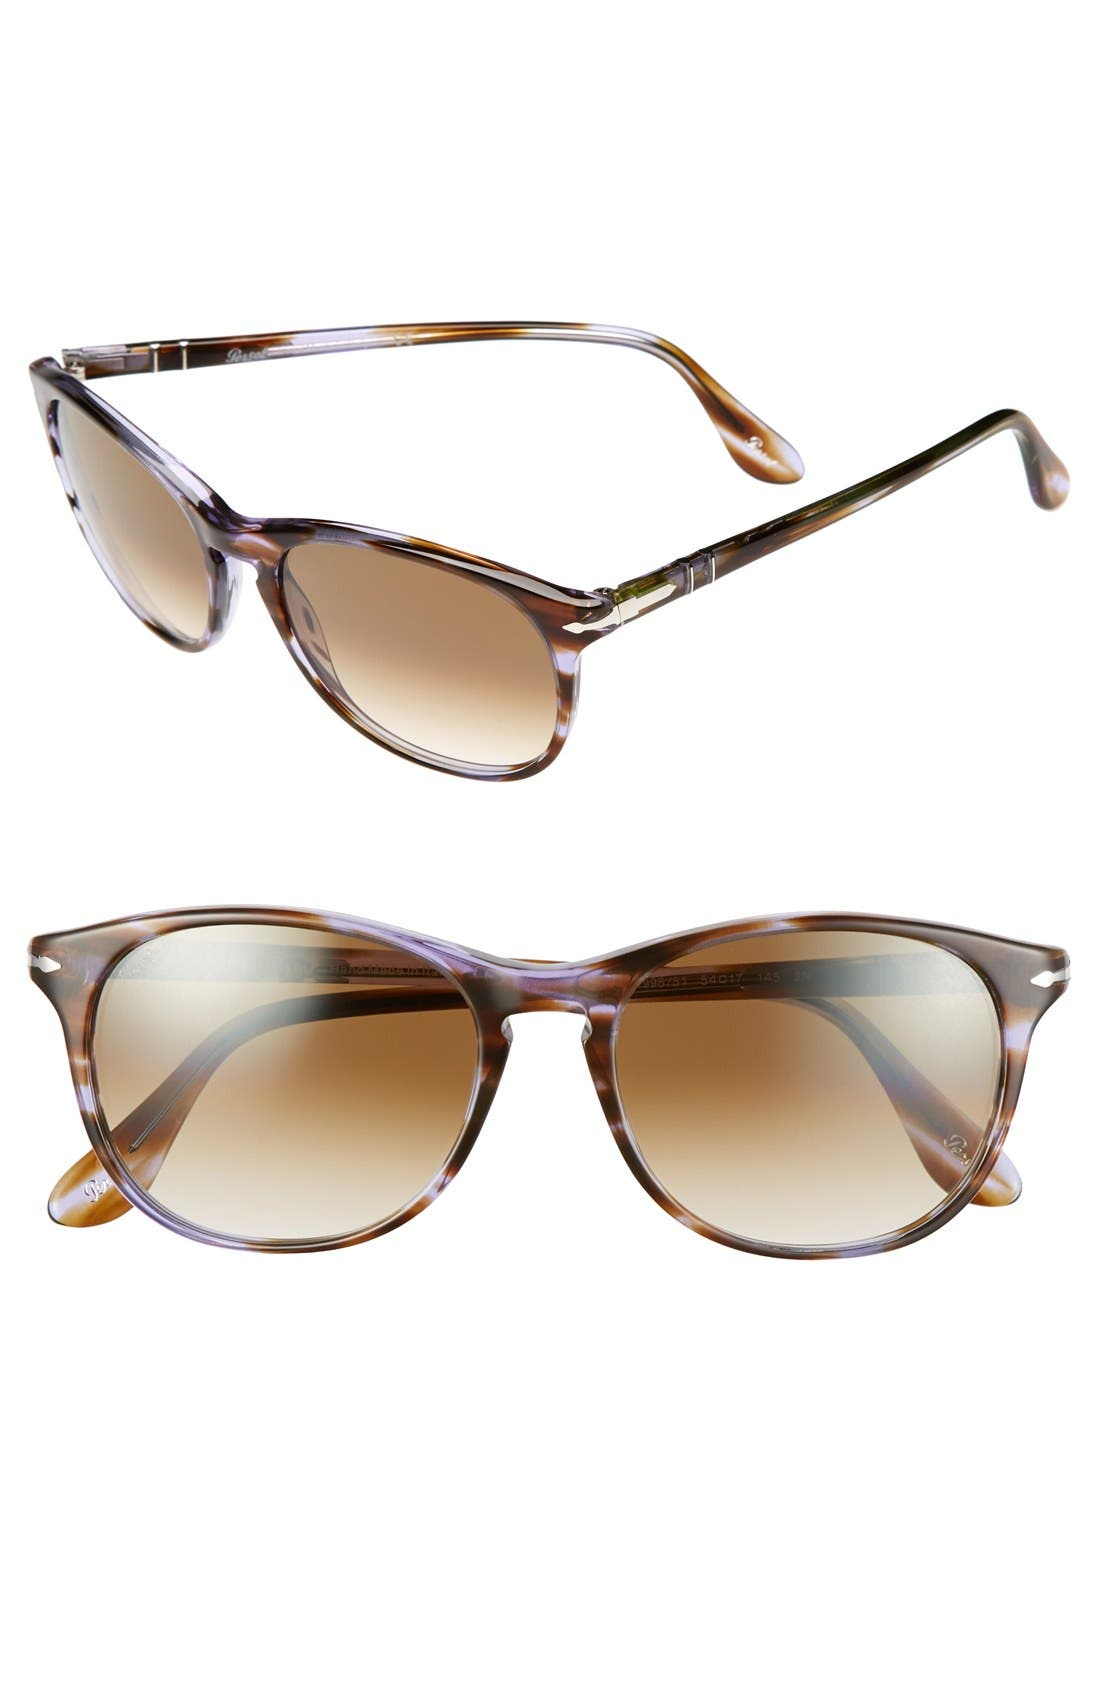 Alternate Image 1 Selected - Persol 'Suprema Circle' 54mm Sunglasses